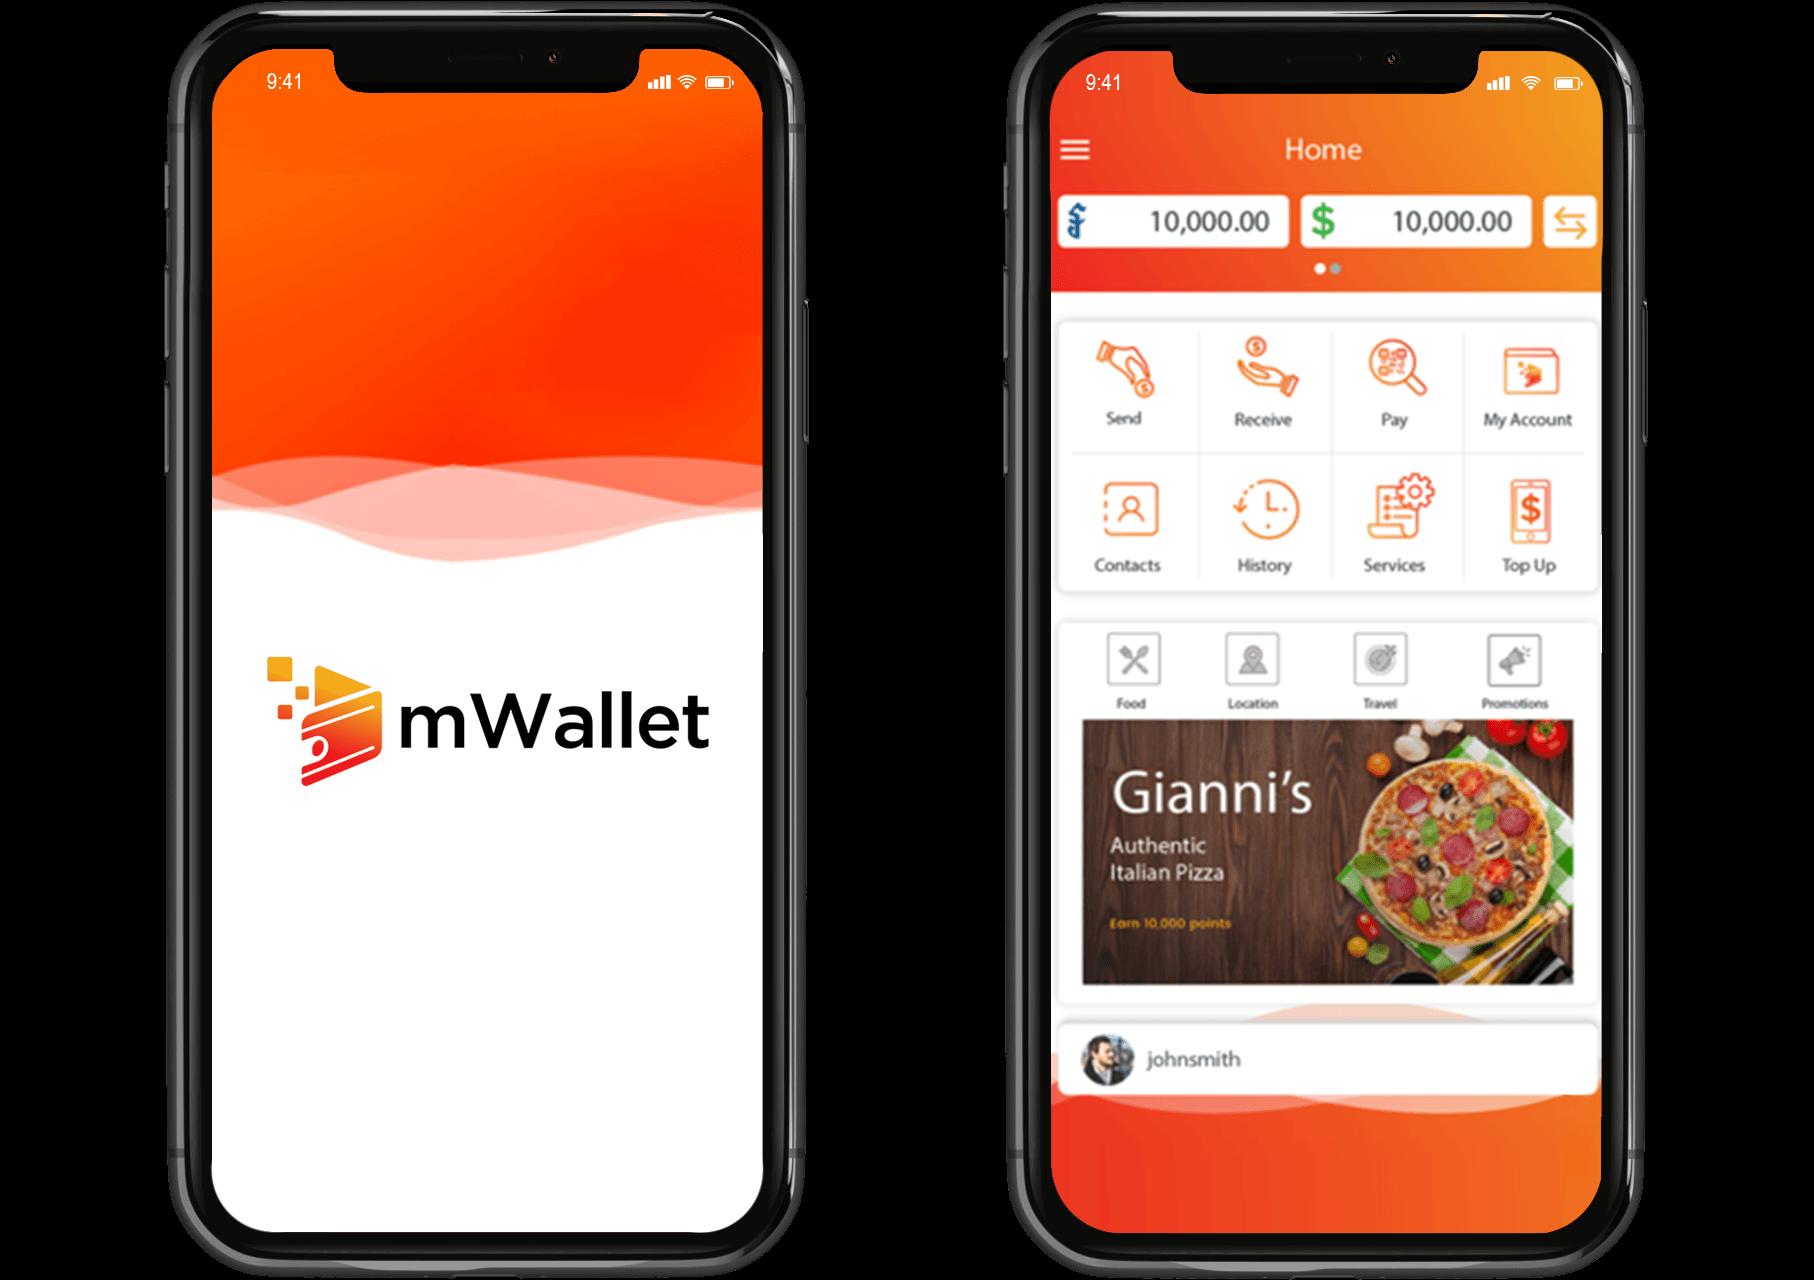 mwallet app by proximaxx